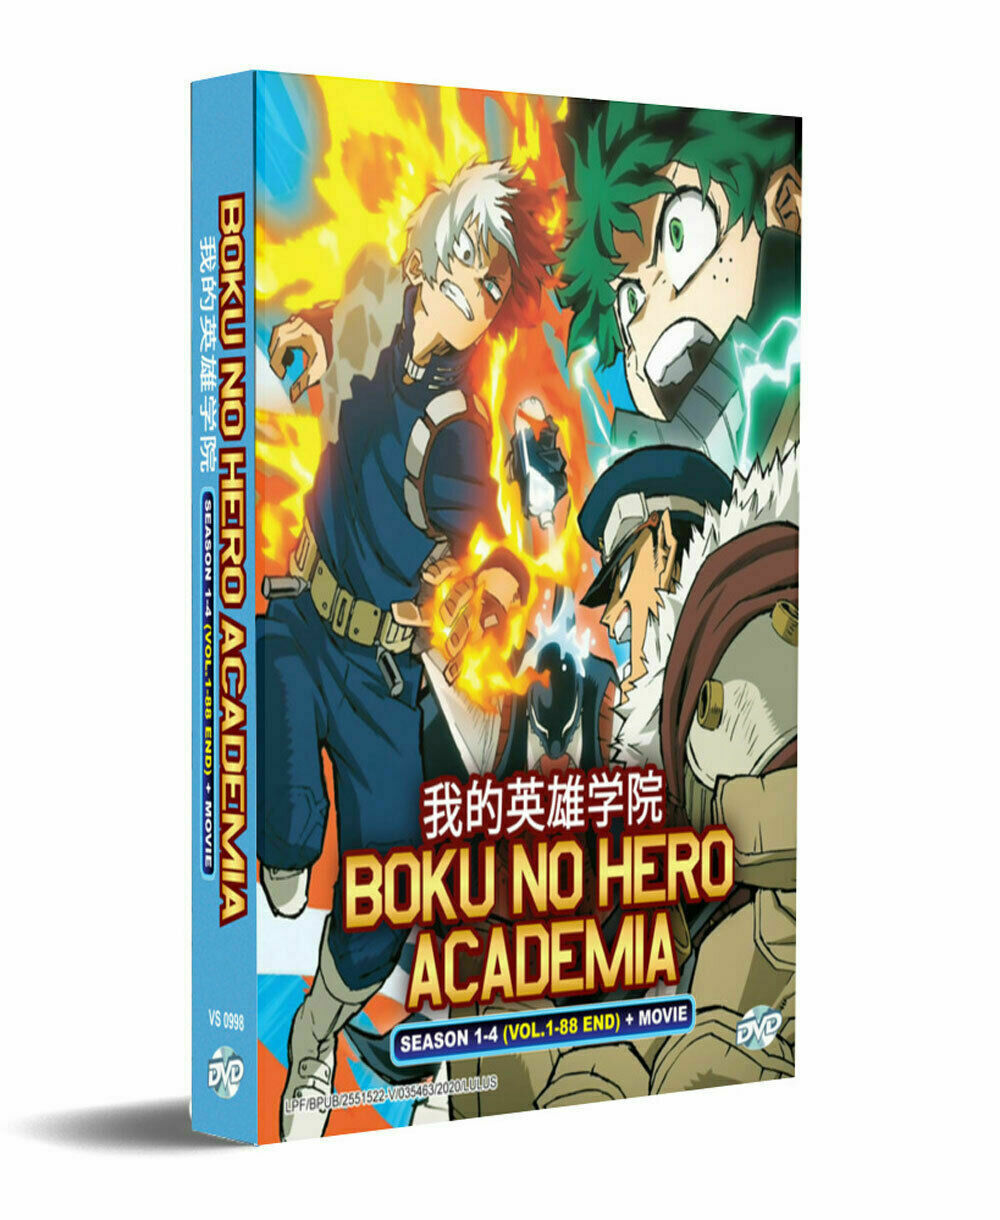 Boku No Hero Academia Season 1-4 DVD Vol.1 - 88 end + Movie English Dubbed USA